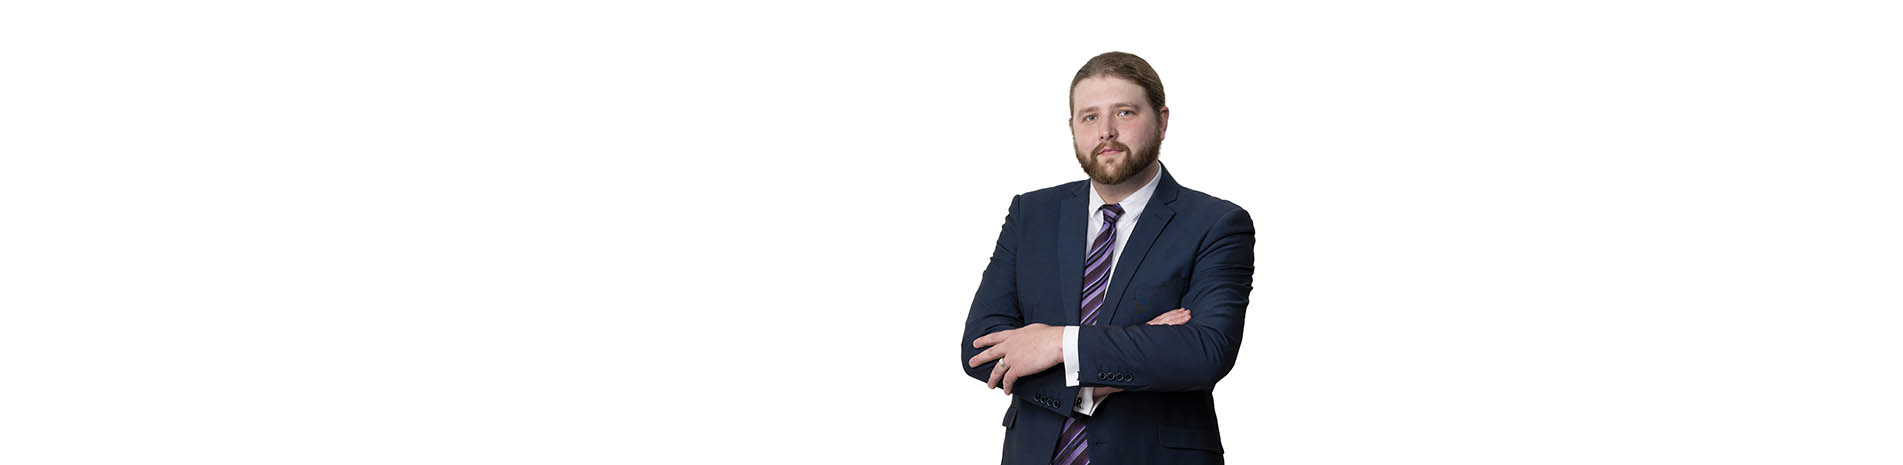 Ryan Robertson Criminal Solicitor Melbourne